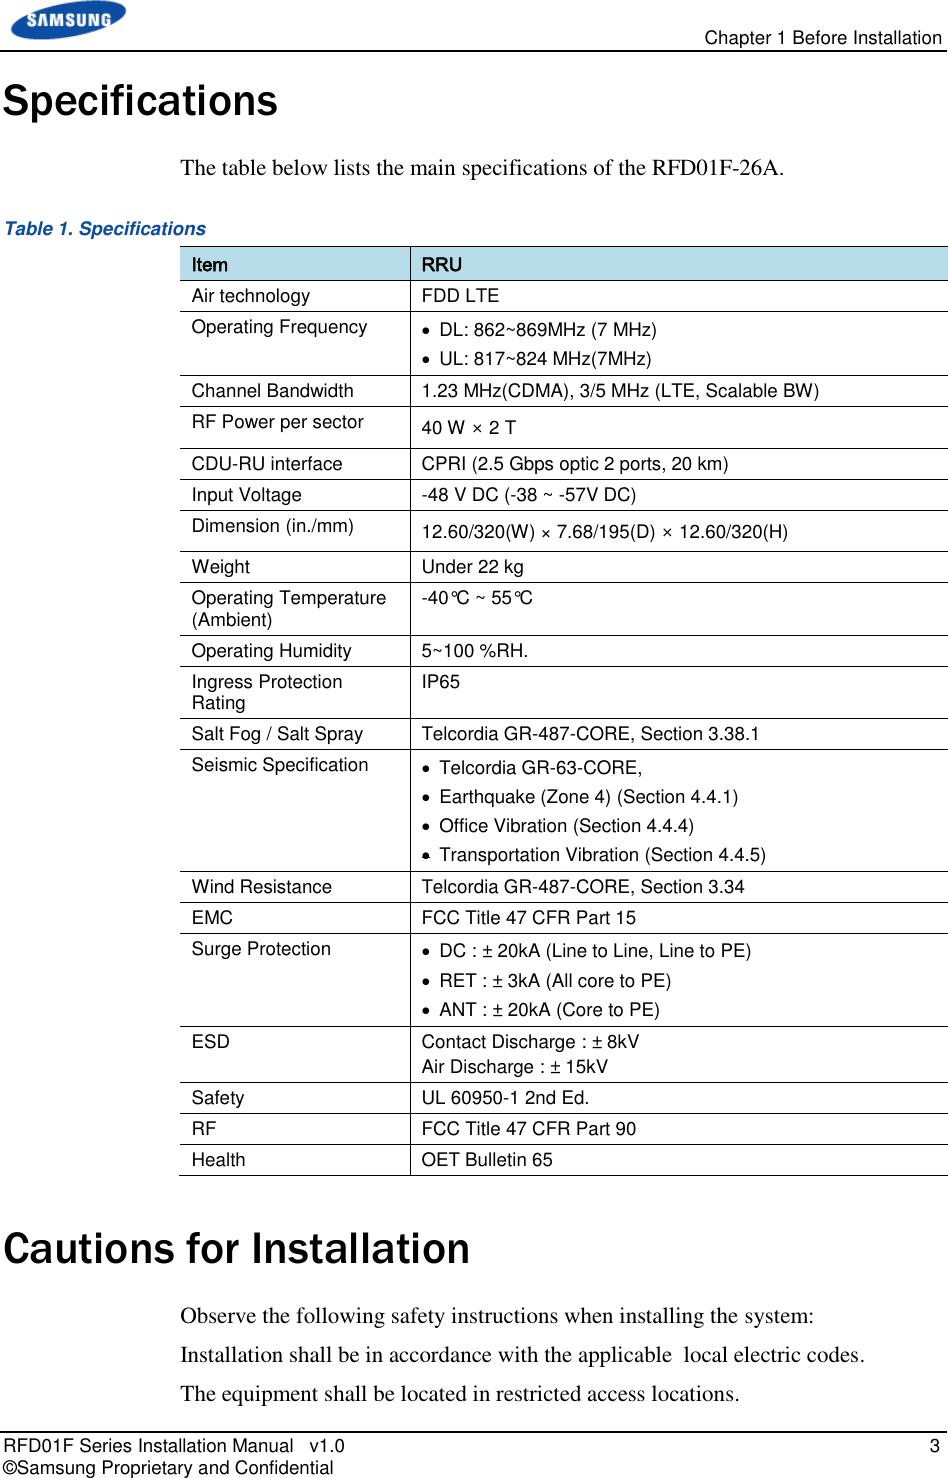 Samsung Electronics Co RFD01F-26A RRU (RFD01F) Base